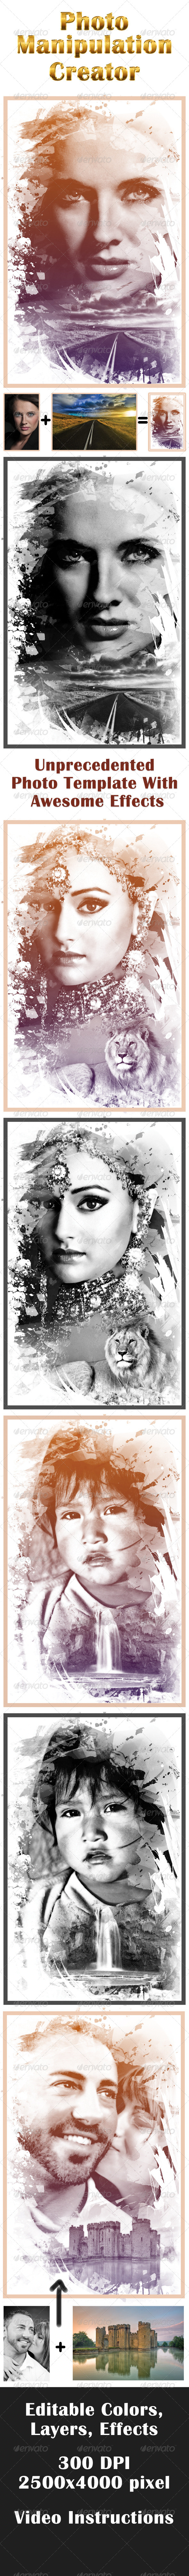 Photo Manipulation Creator - Artistic Photo Templates